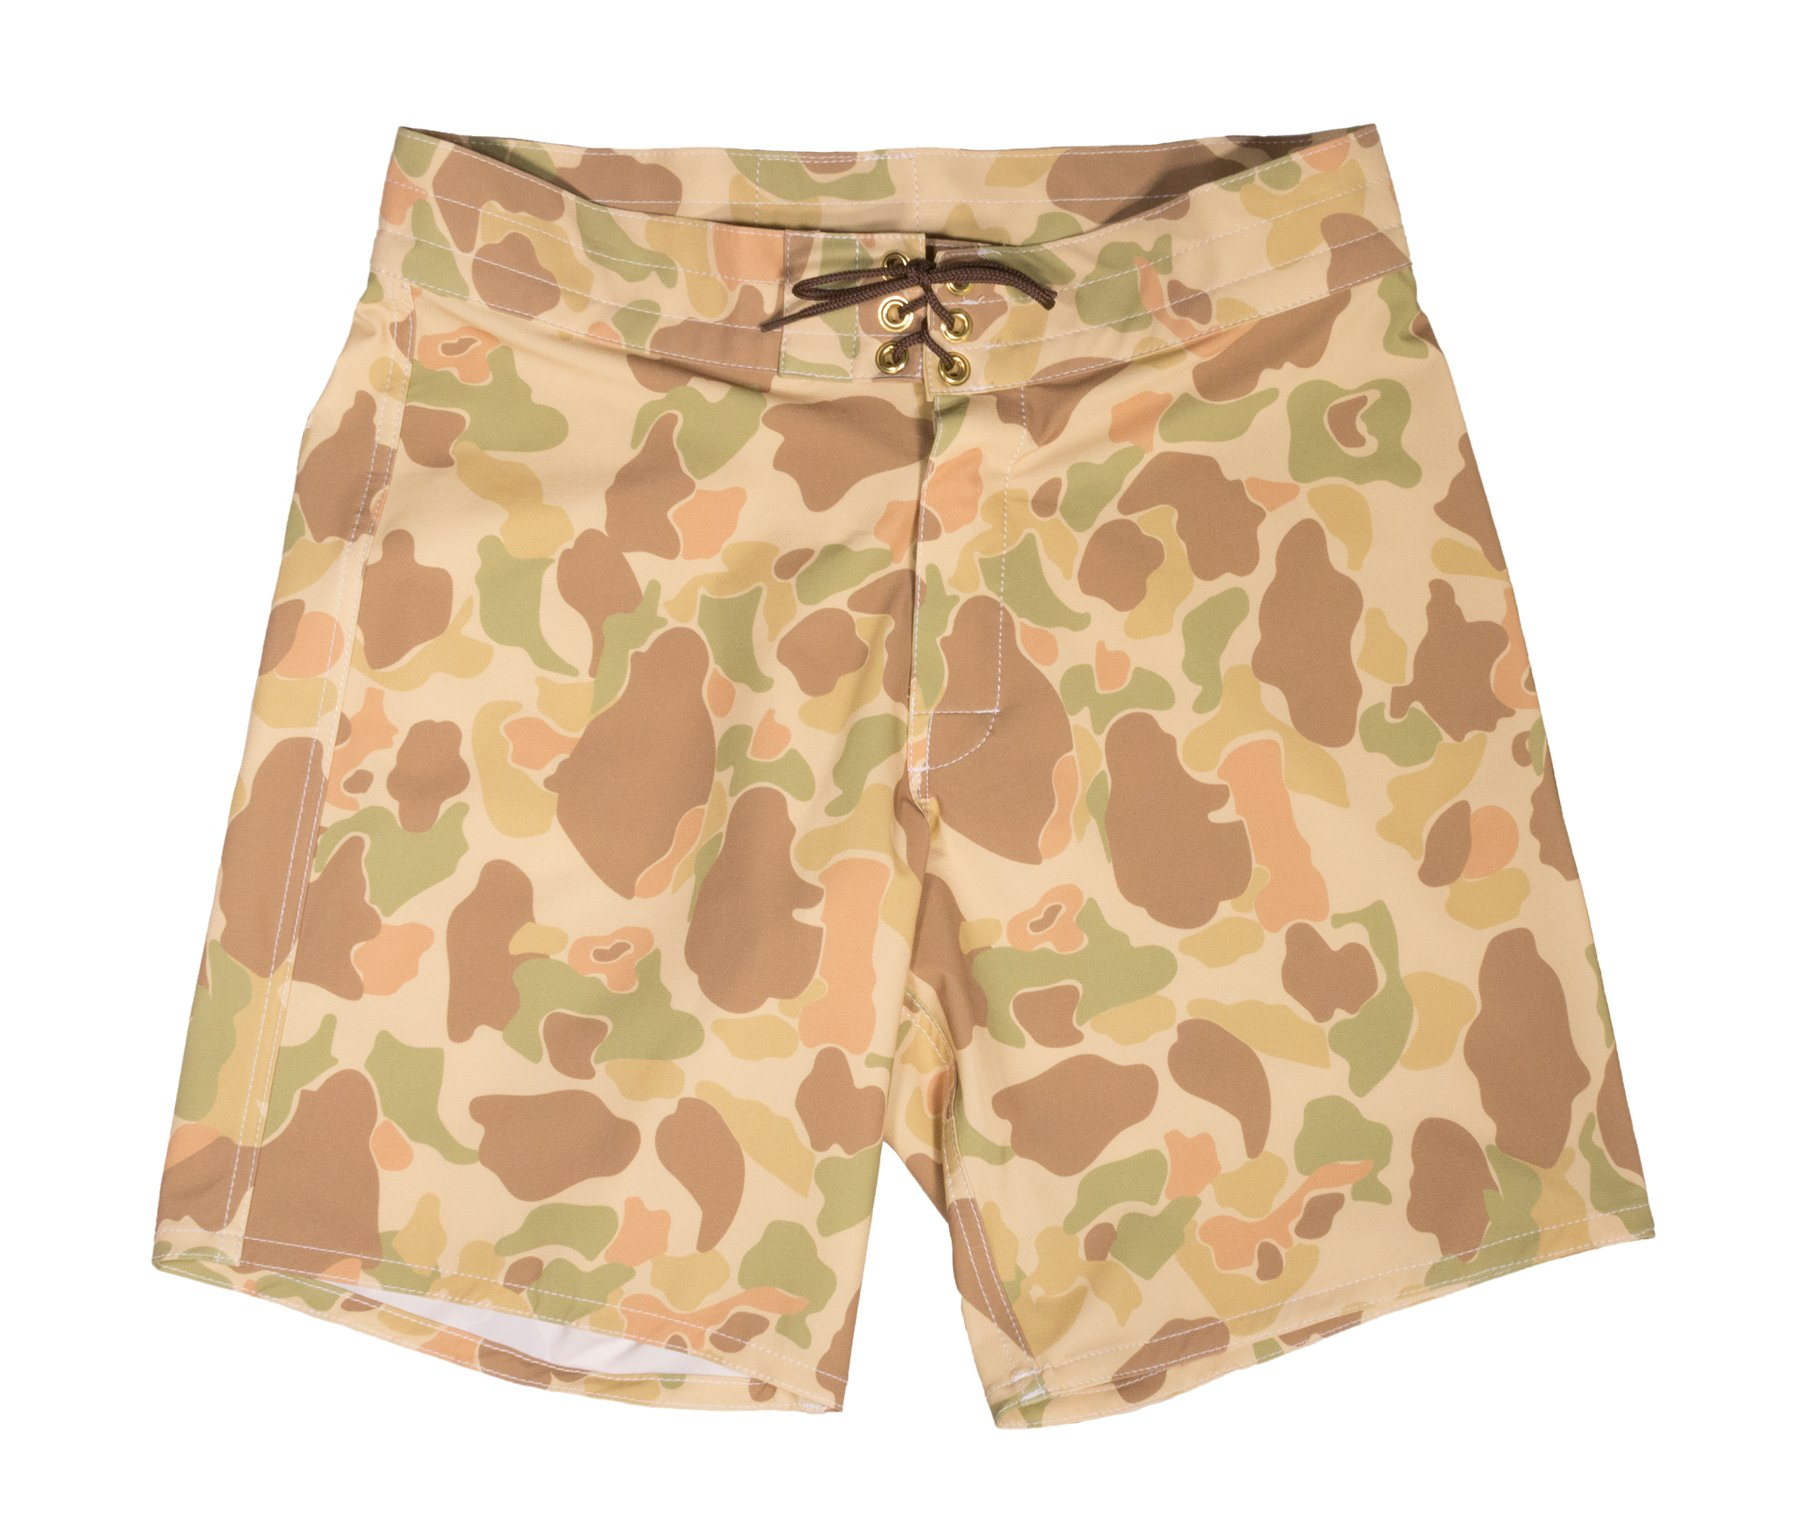 Birdwell Men's Stretch Board Shorts - Medium Length (32, Camouflage)